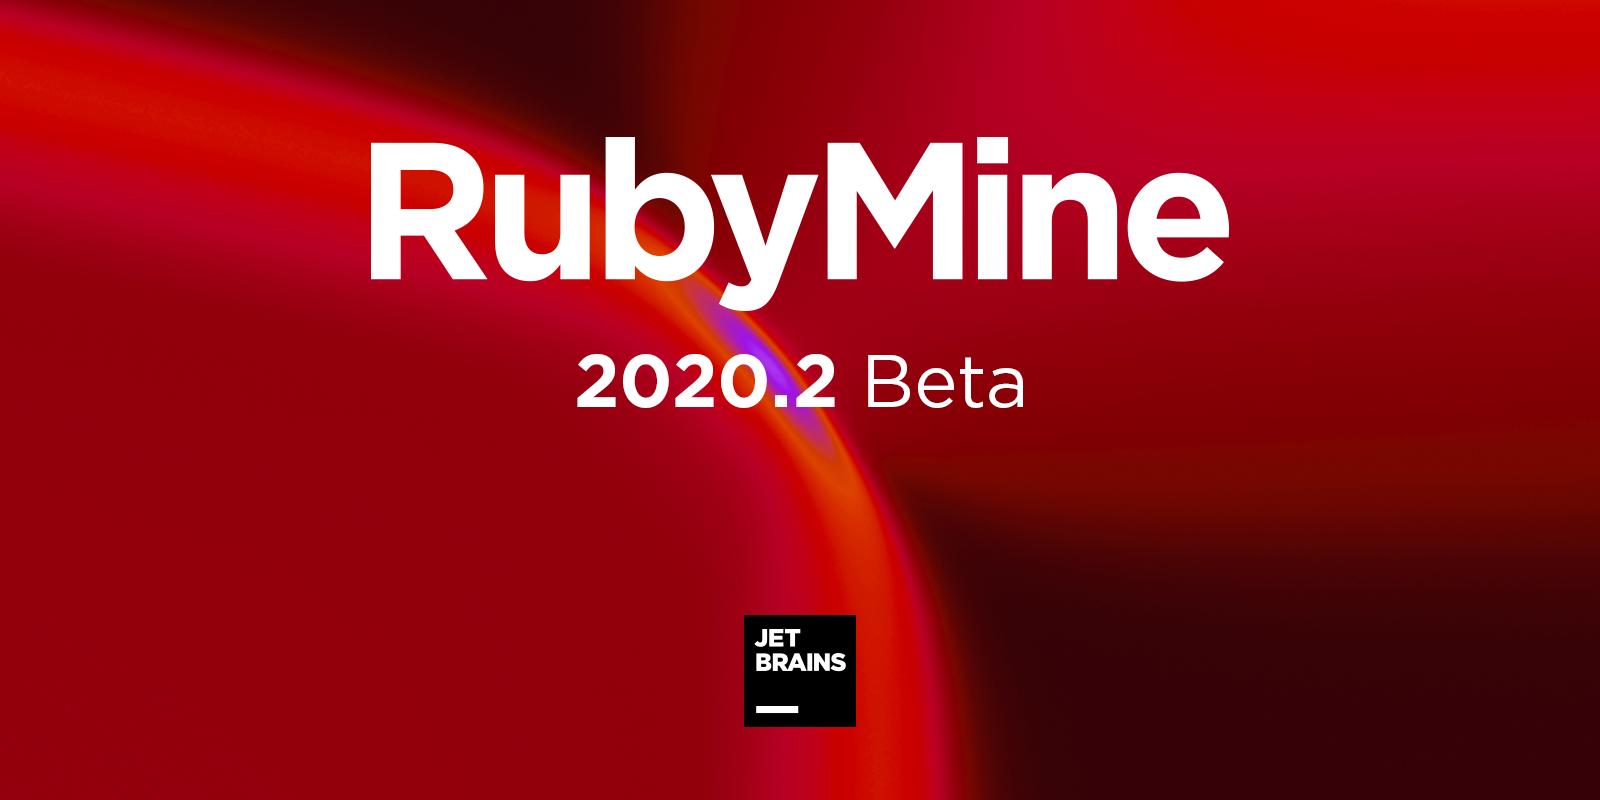 RubyMine 2020.2 Beta banner